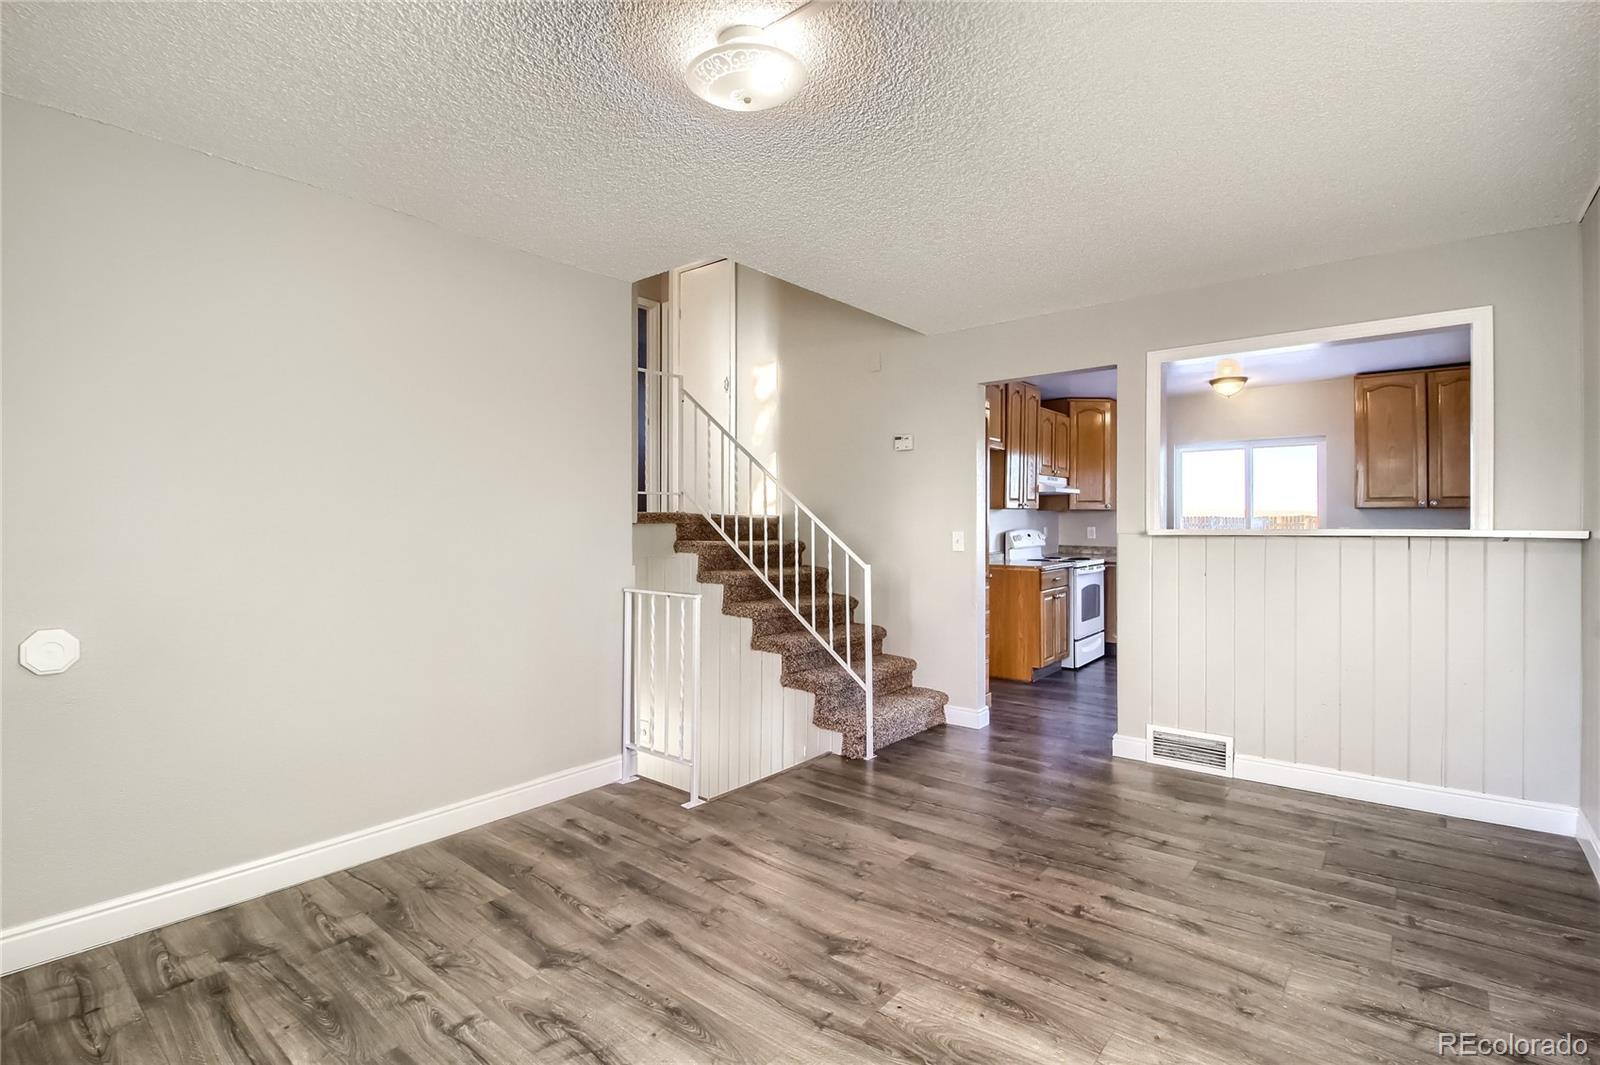 MLS# 8804701 - 6 - 20615 E Coolidge Place, Aurora, CO 80011